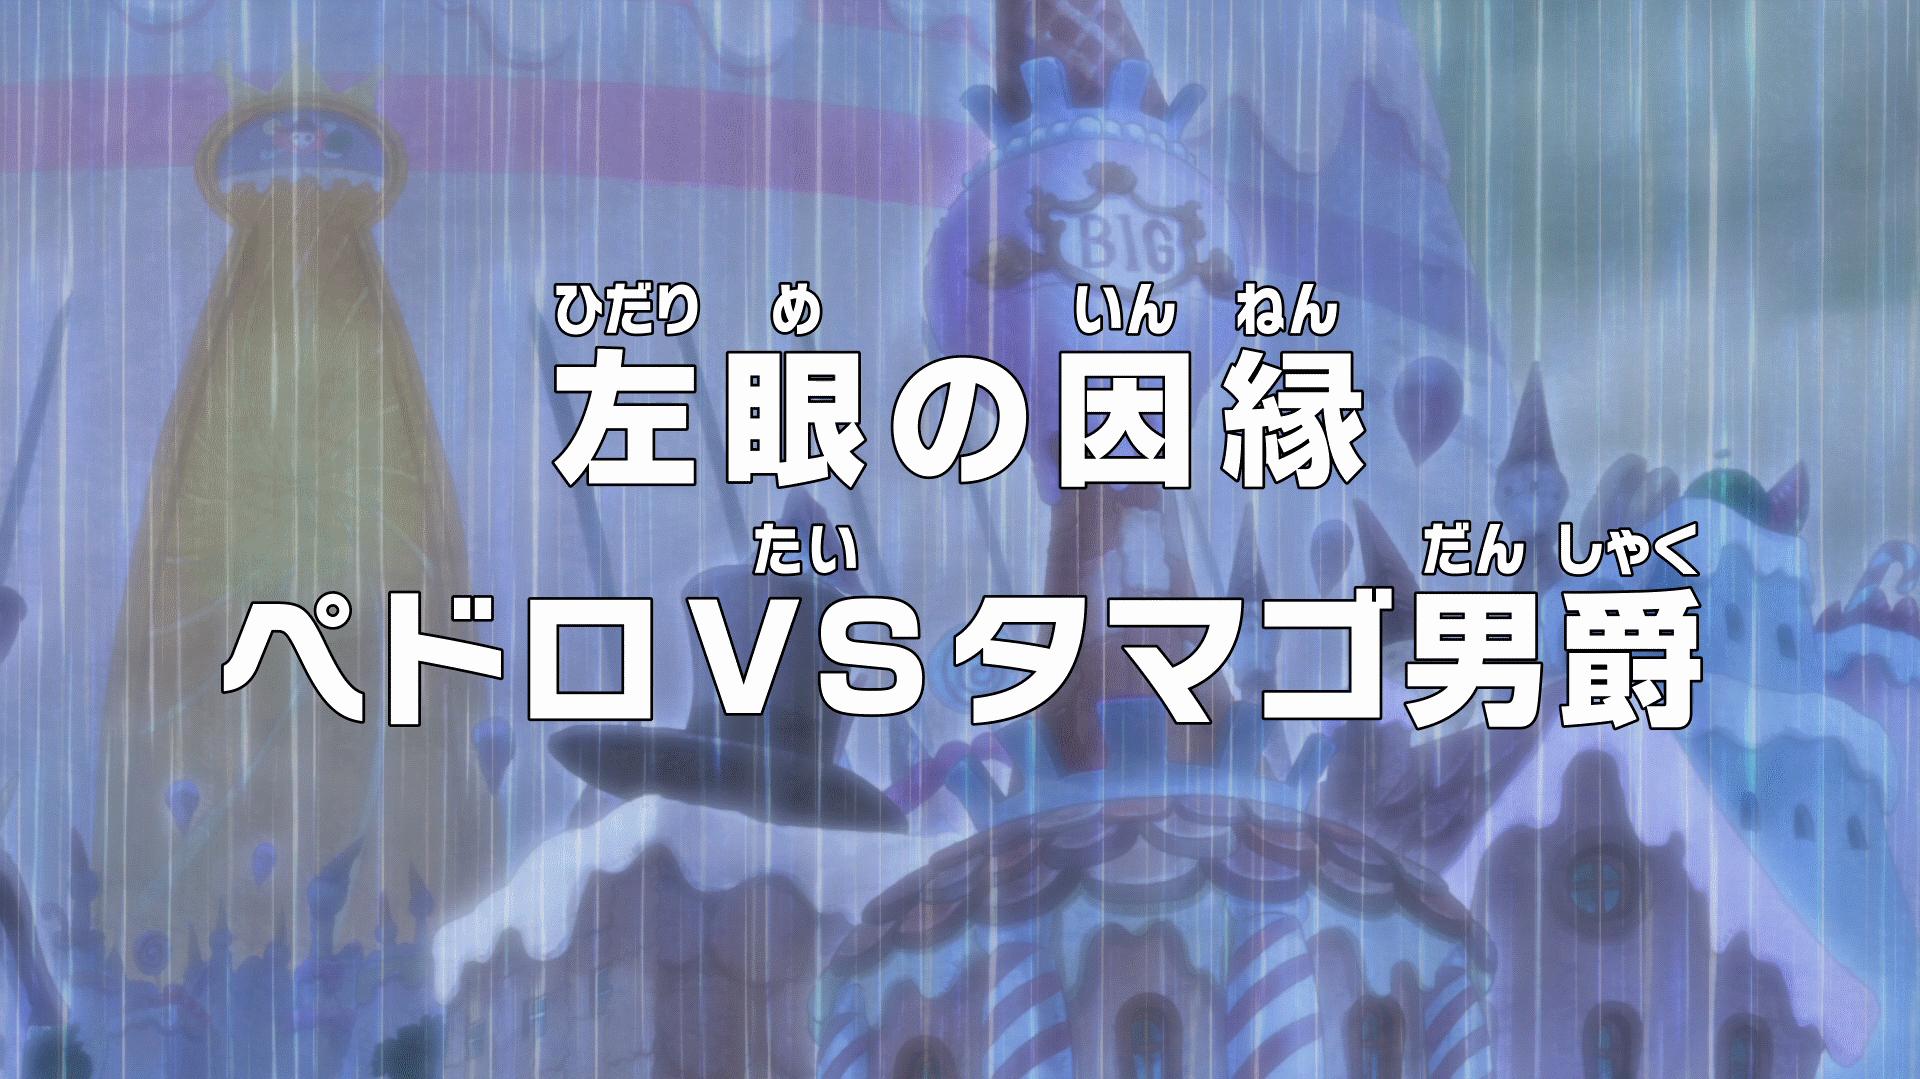 Episode 816